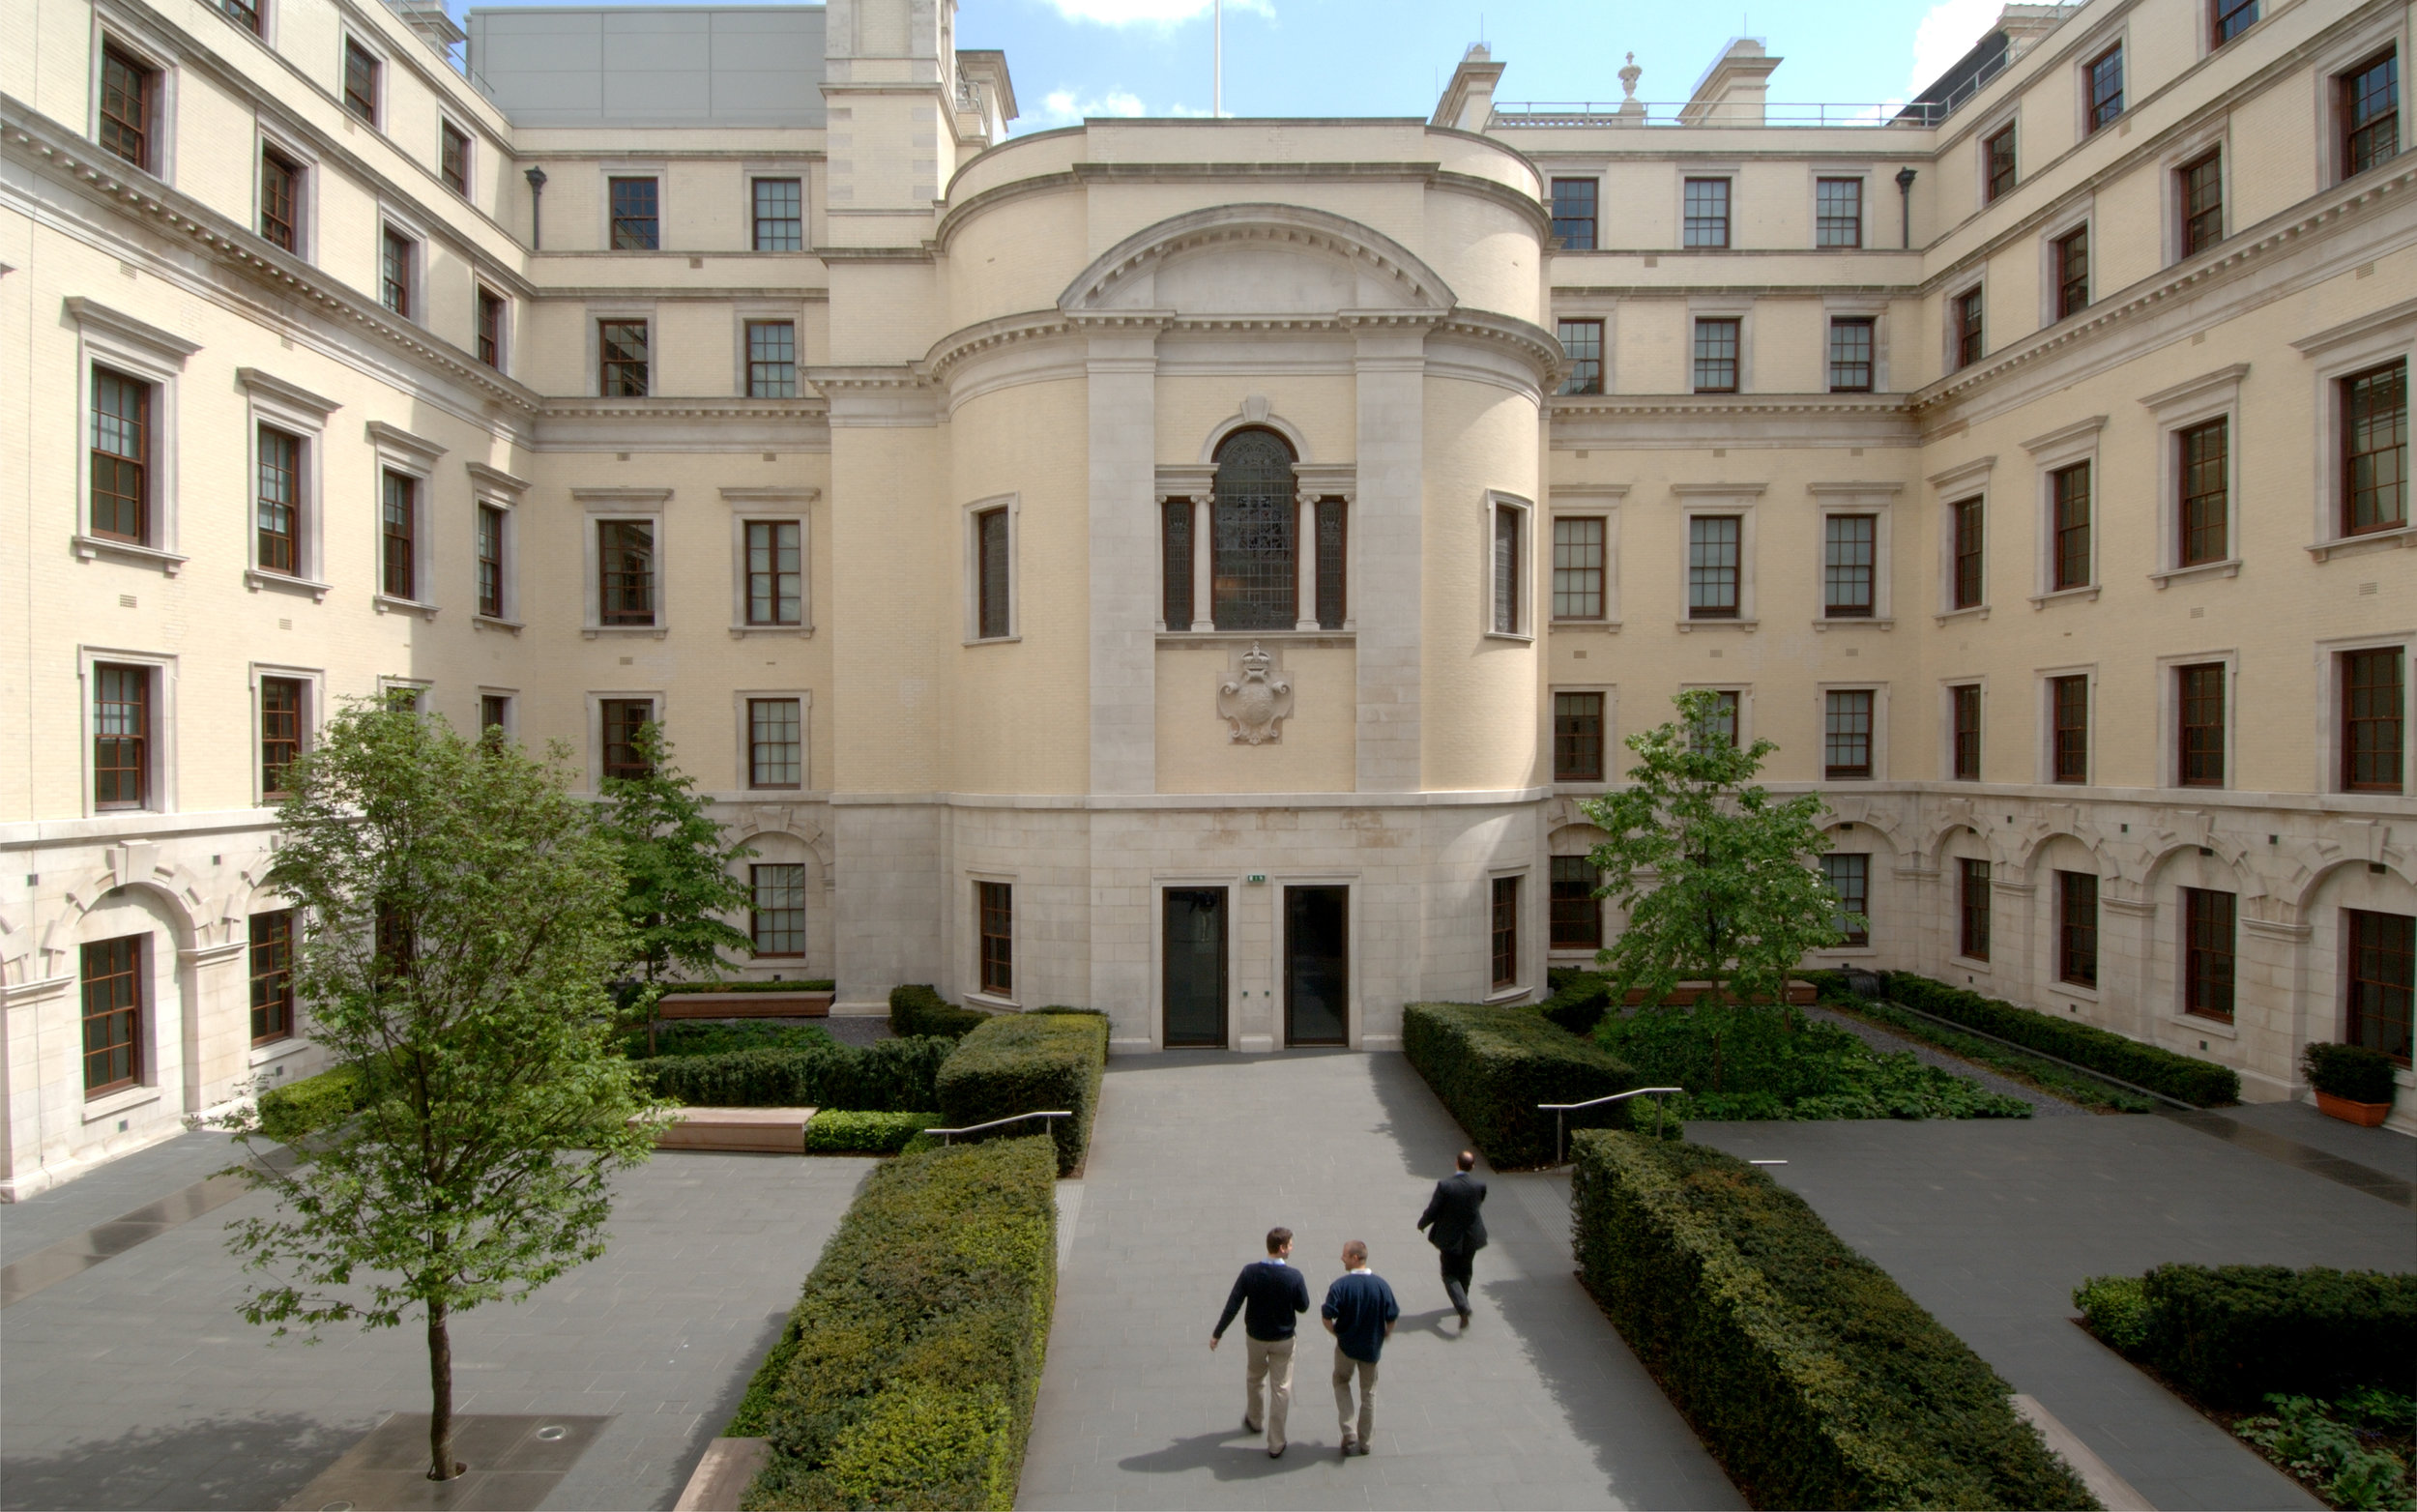 East Courtyard